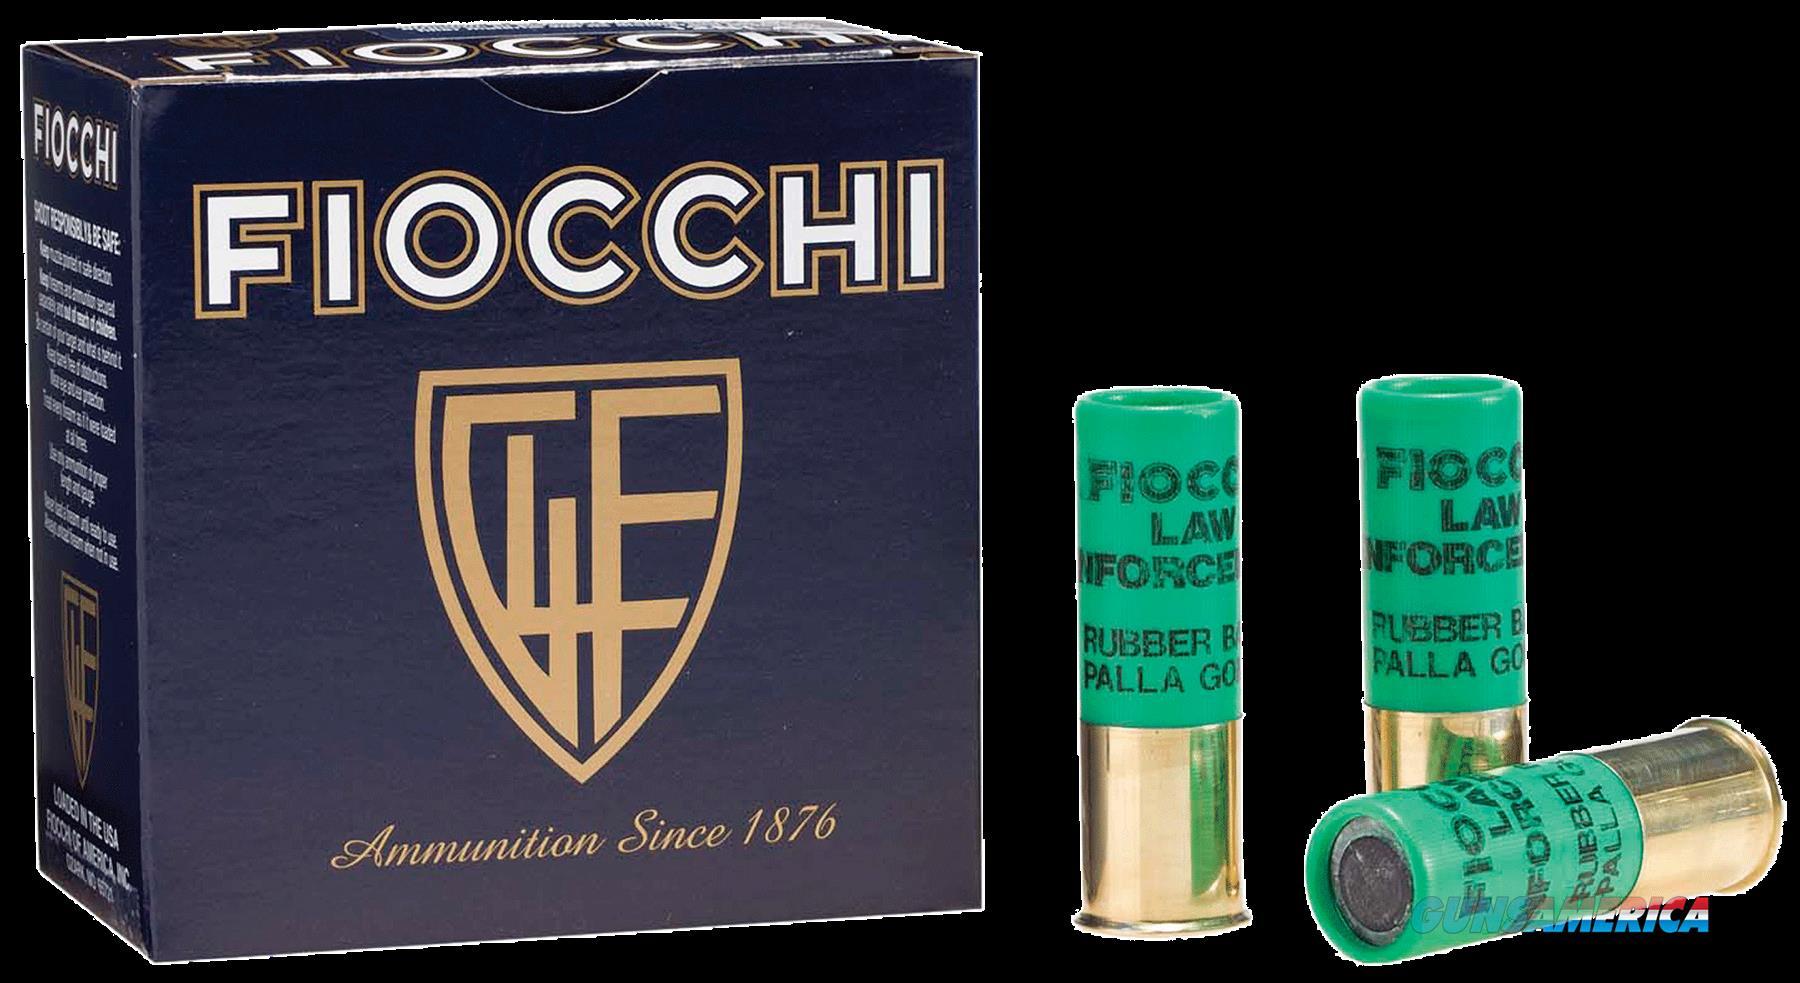 Fiocchi Exacta, Fio 12lebat   12 Baton Slug Buck  25-10  Guns > Pistols > 1911 Pistol Copies (non-Colt)